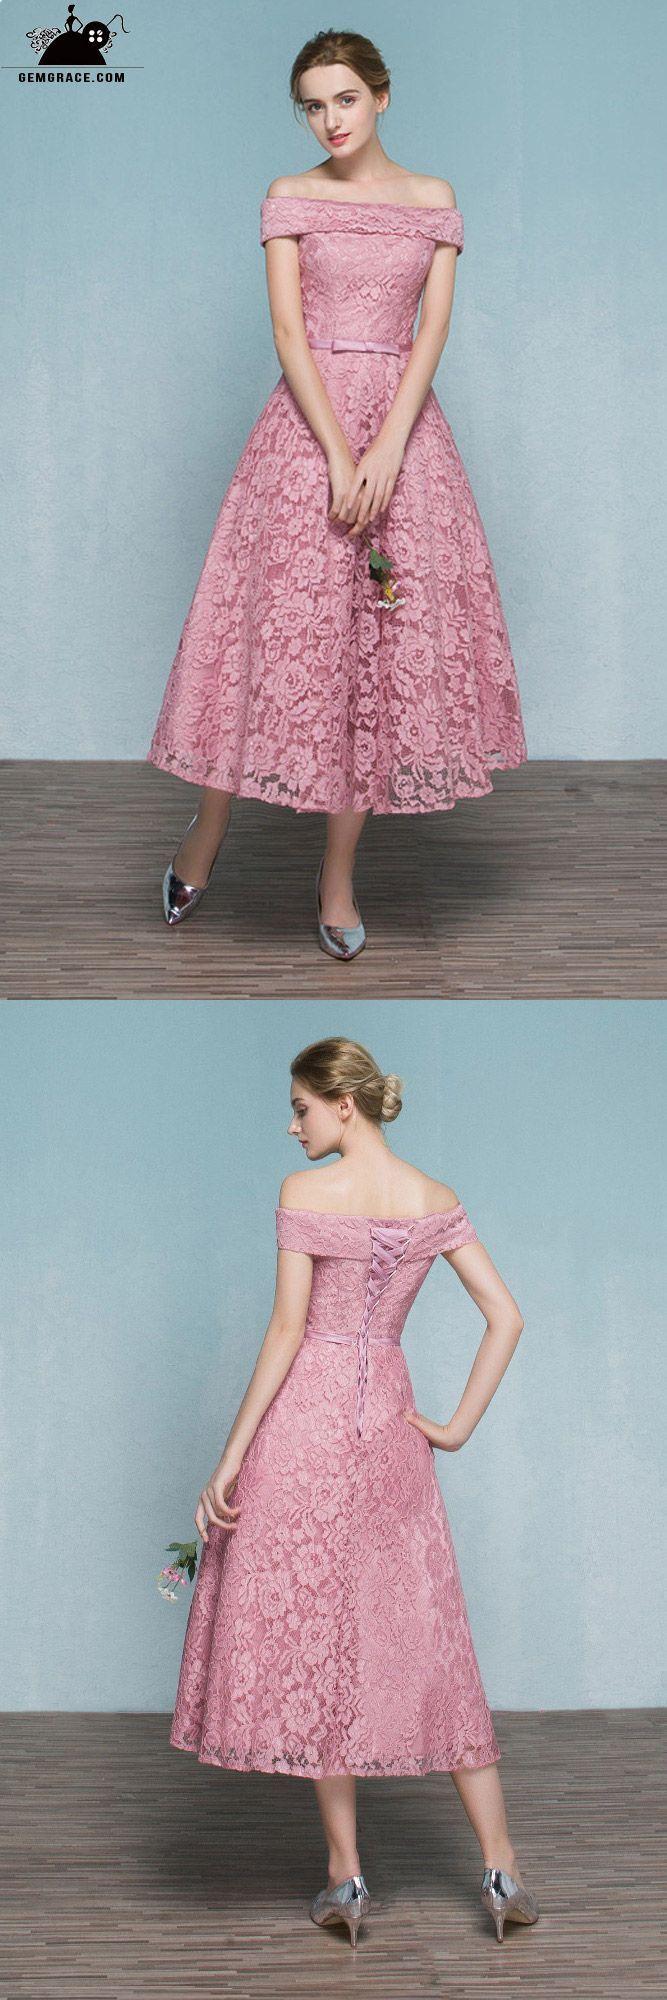 Pink lace tea length off shoulder wedding party dress reception